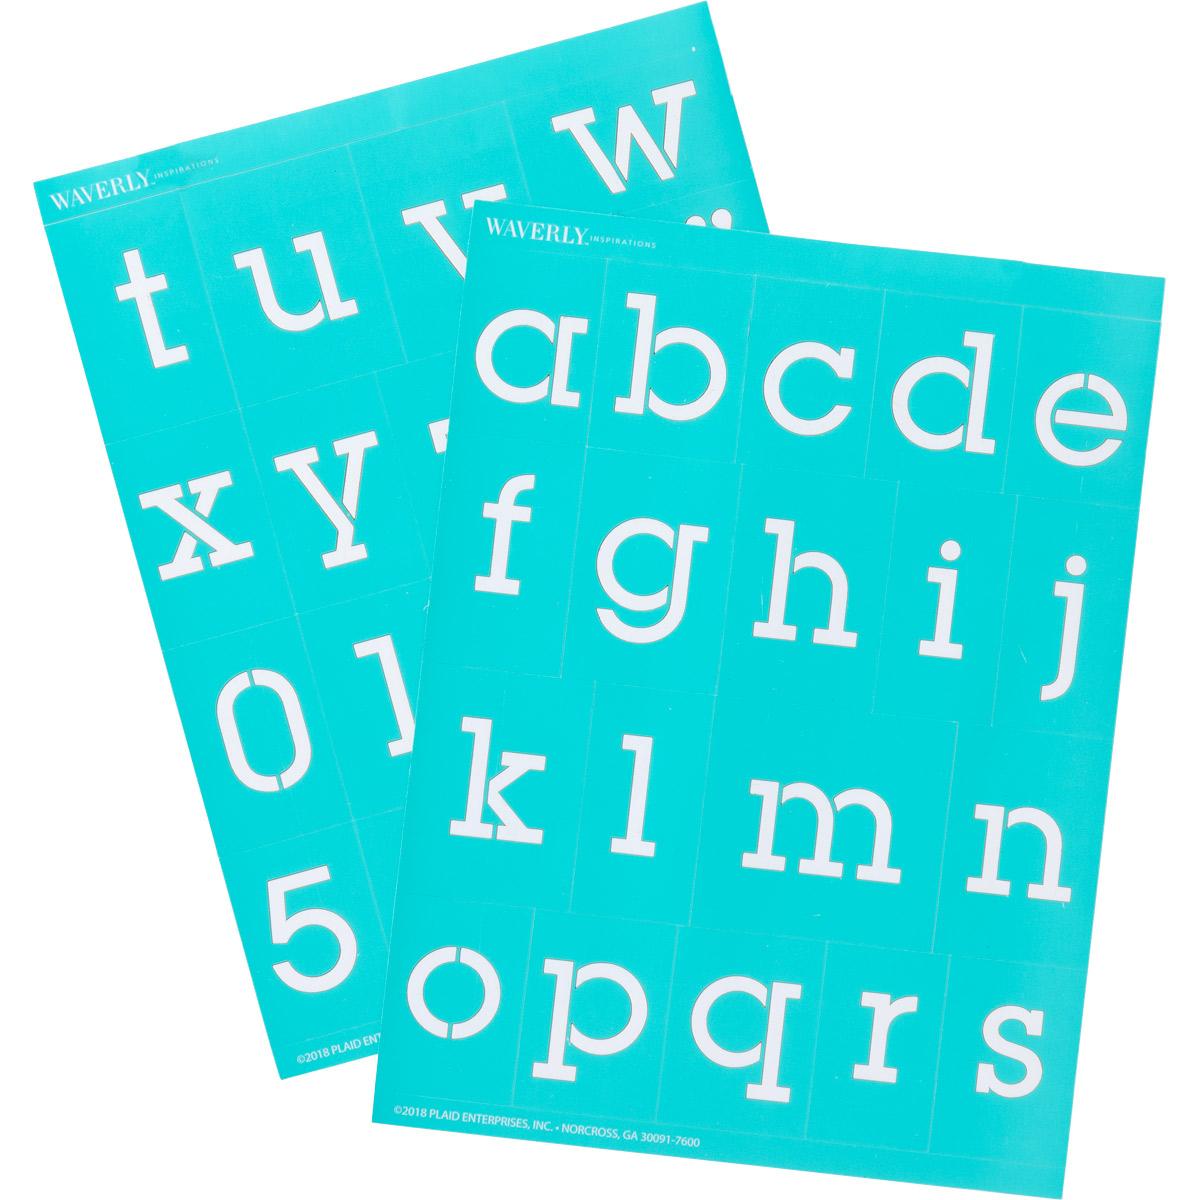 Waverly ® Inspirations Laser-cut Adhesive Stencils - Lowercase Serif Alphabet, 6